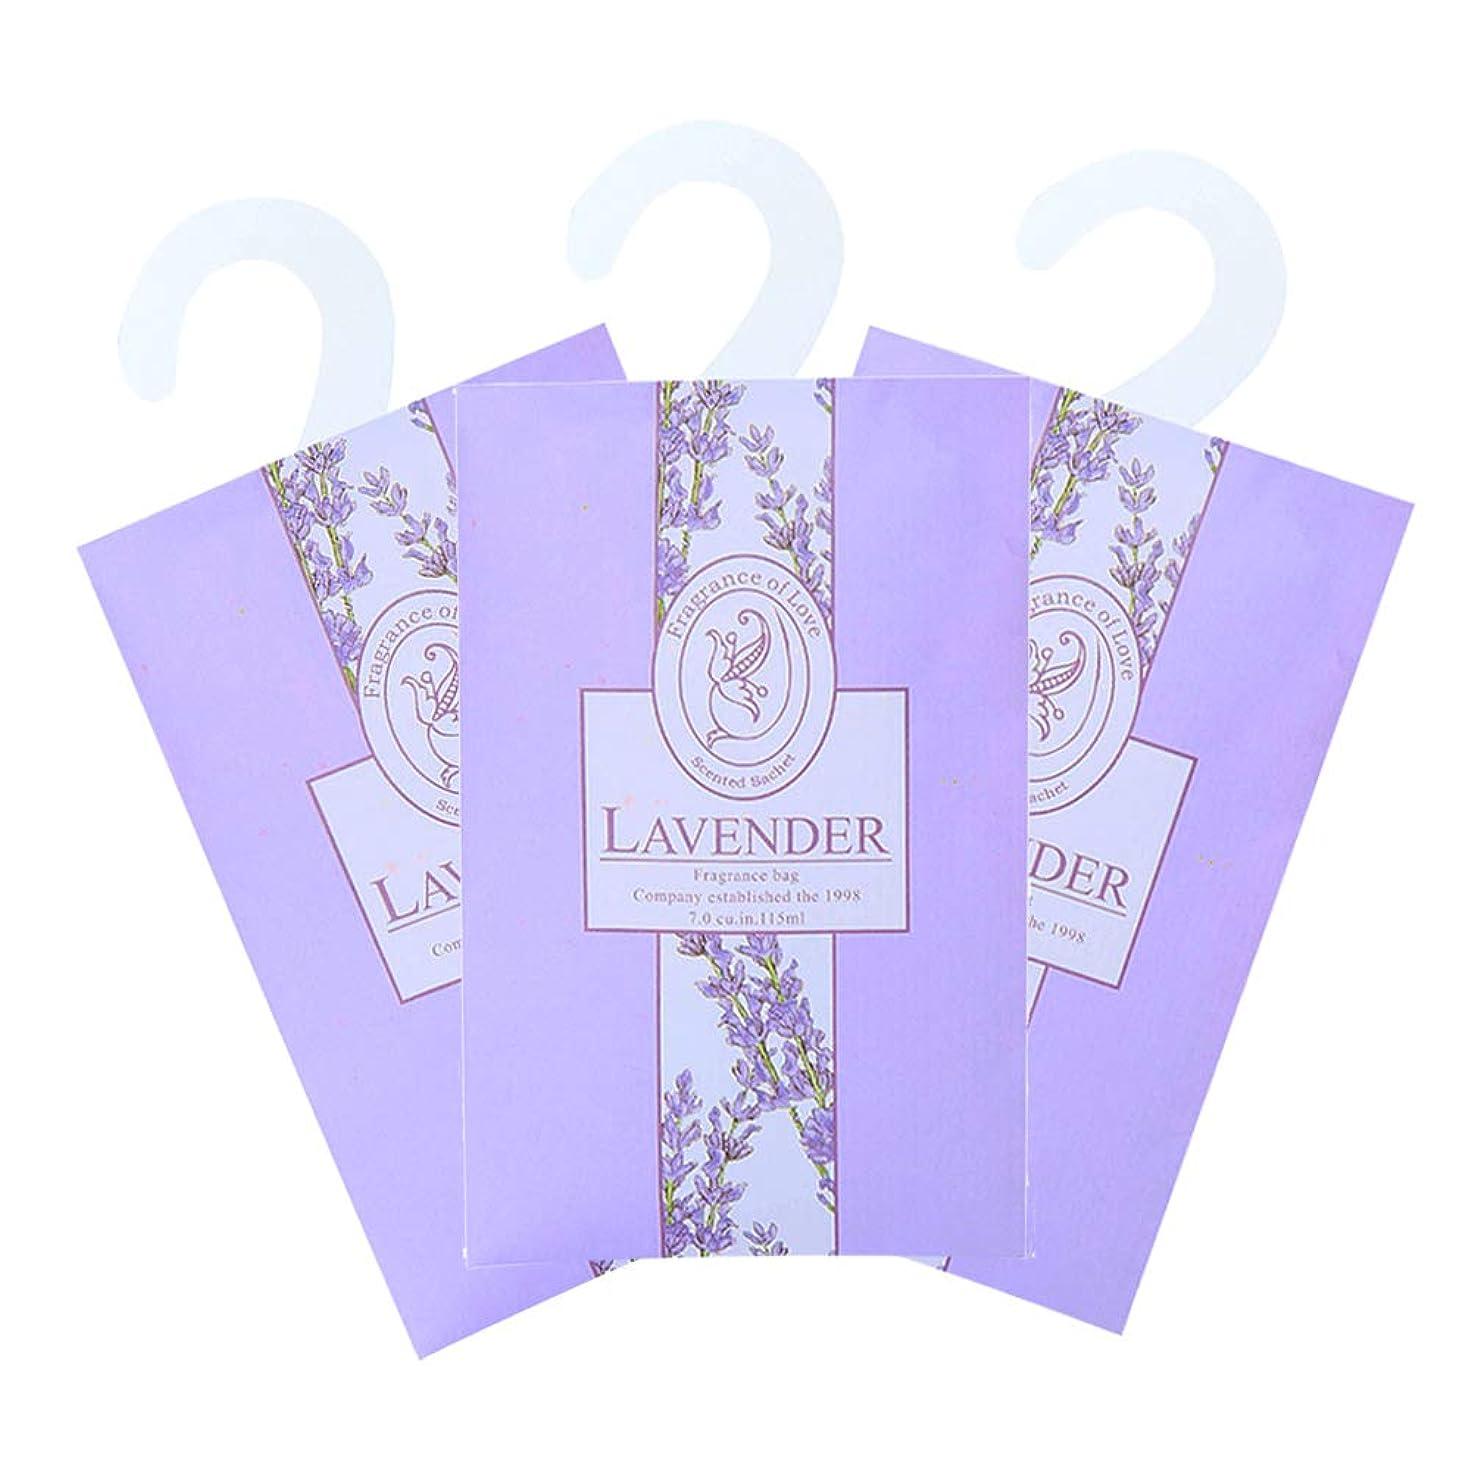 TINKSKY 香り袋 サシェ 3枚セット 花の香り ルームフレグランス 車内用 玄関用 部屋用 芳香剤(ラベンダー)